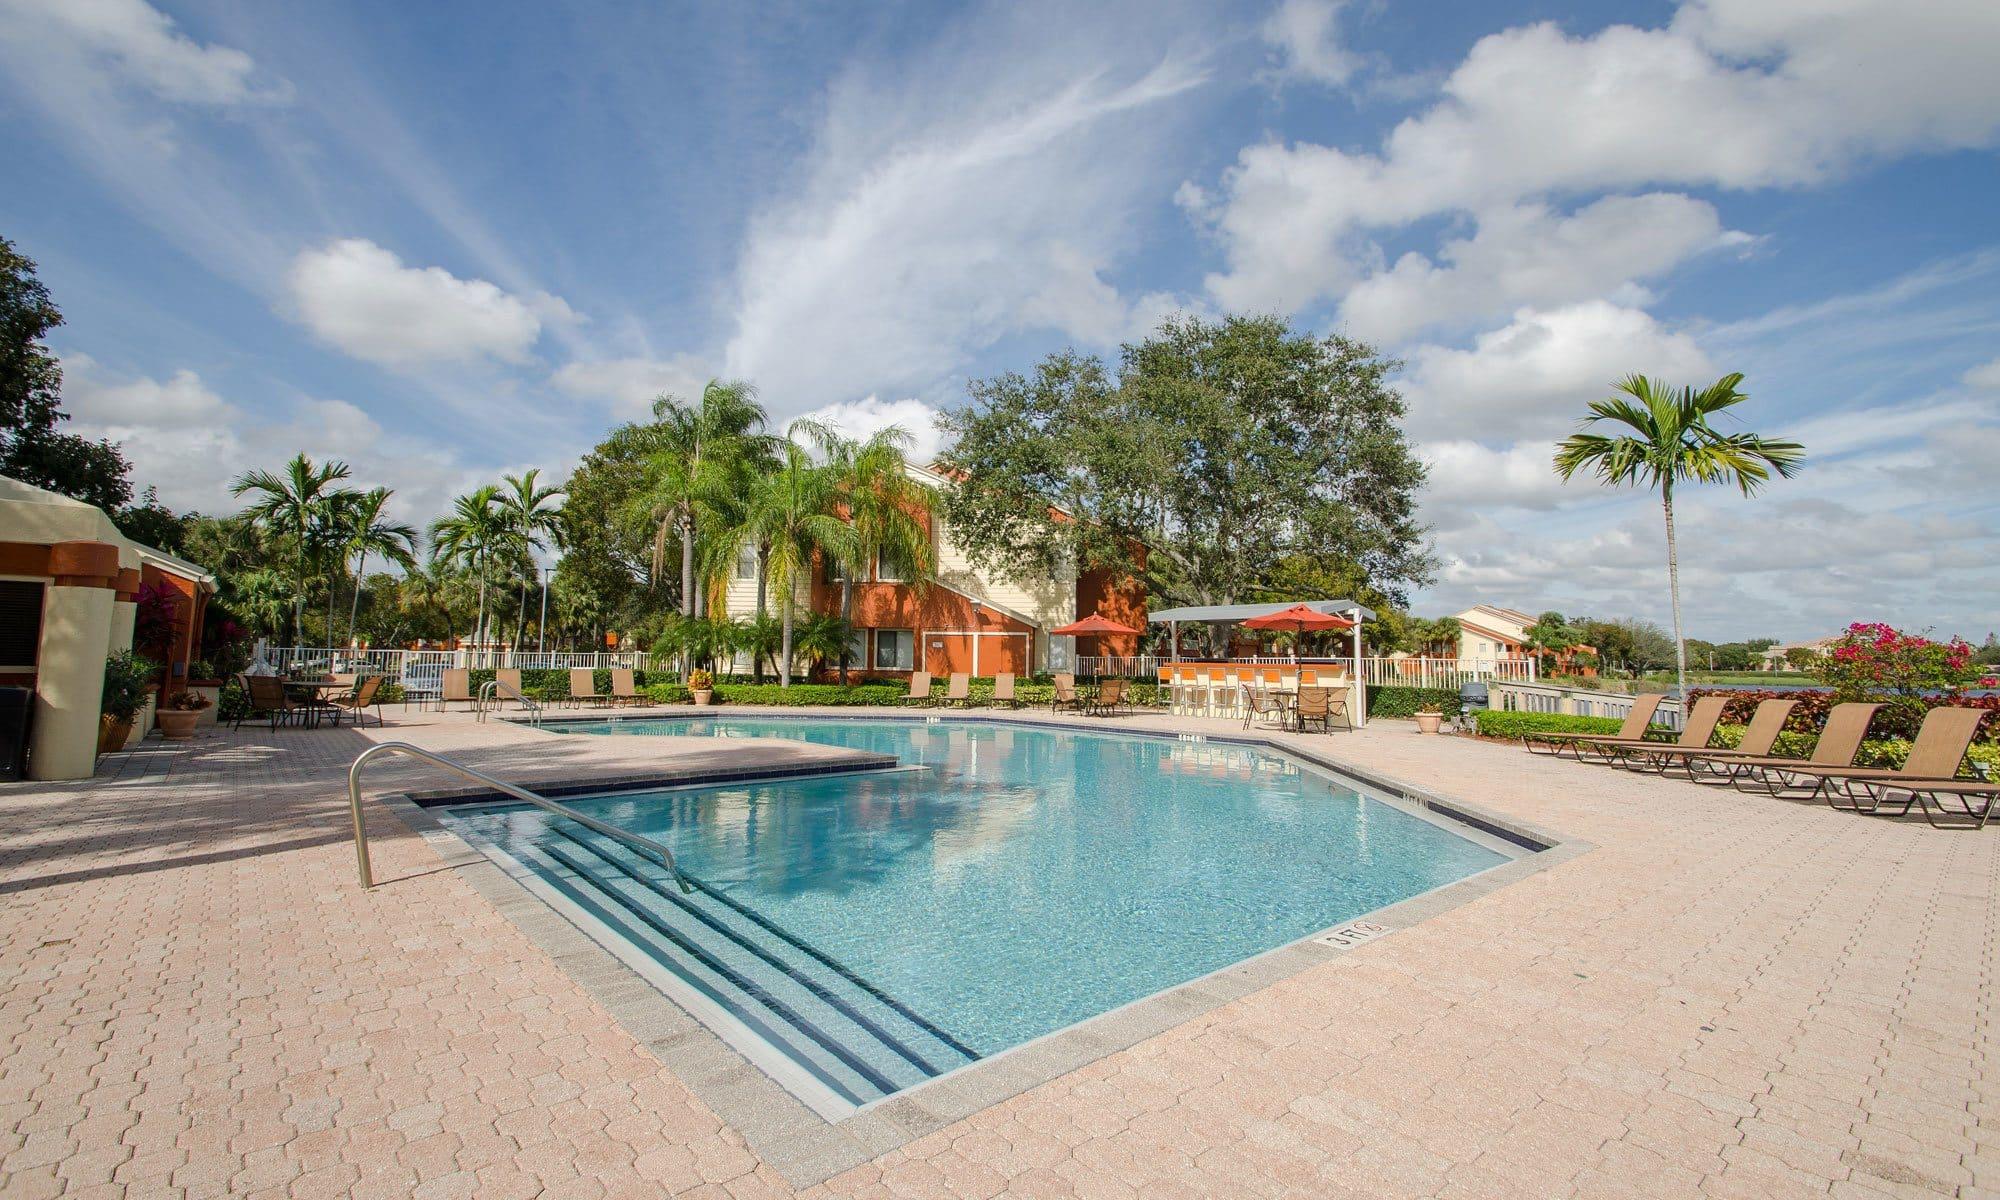 Apartments in Boynton Beach, FL